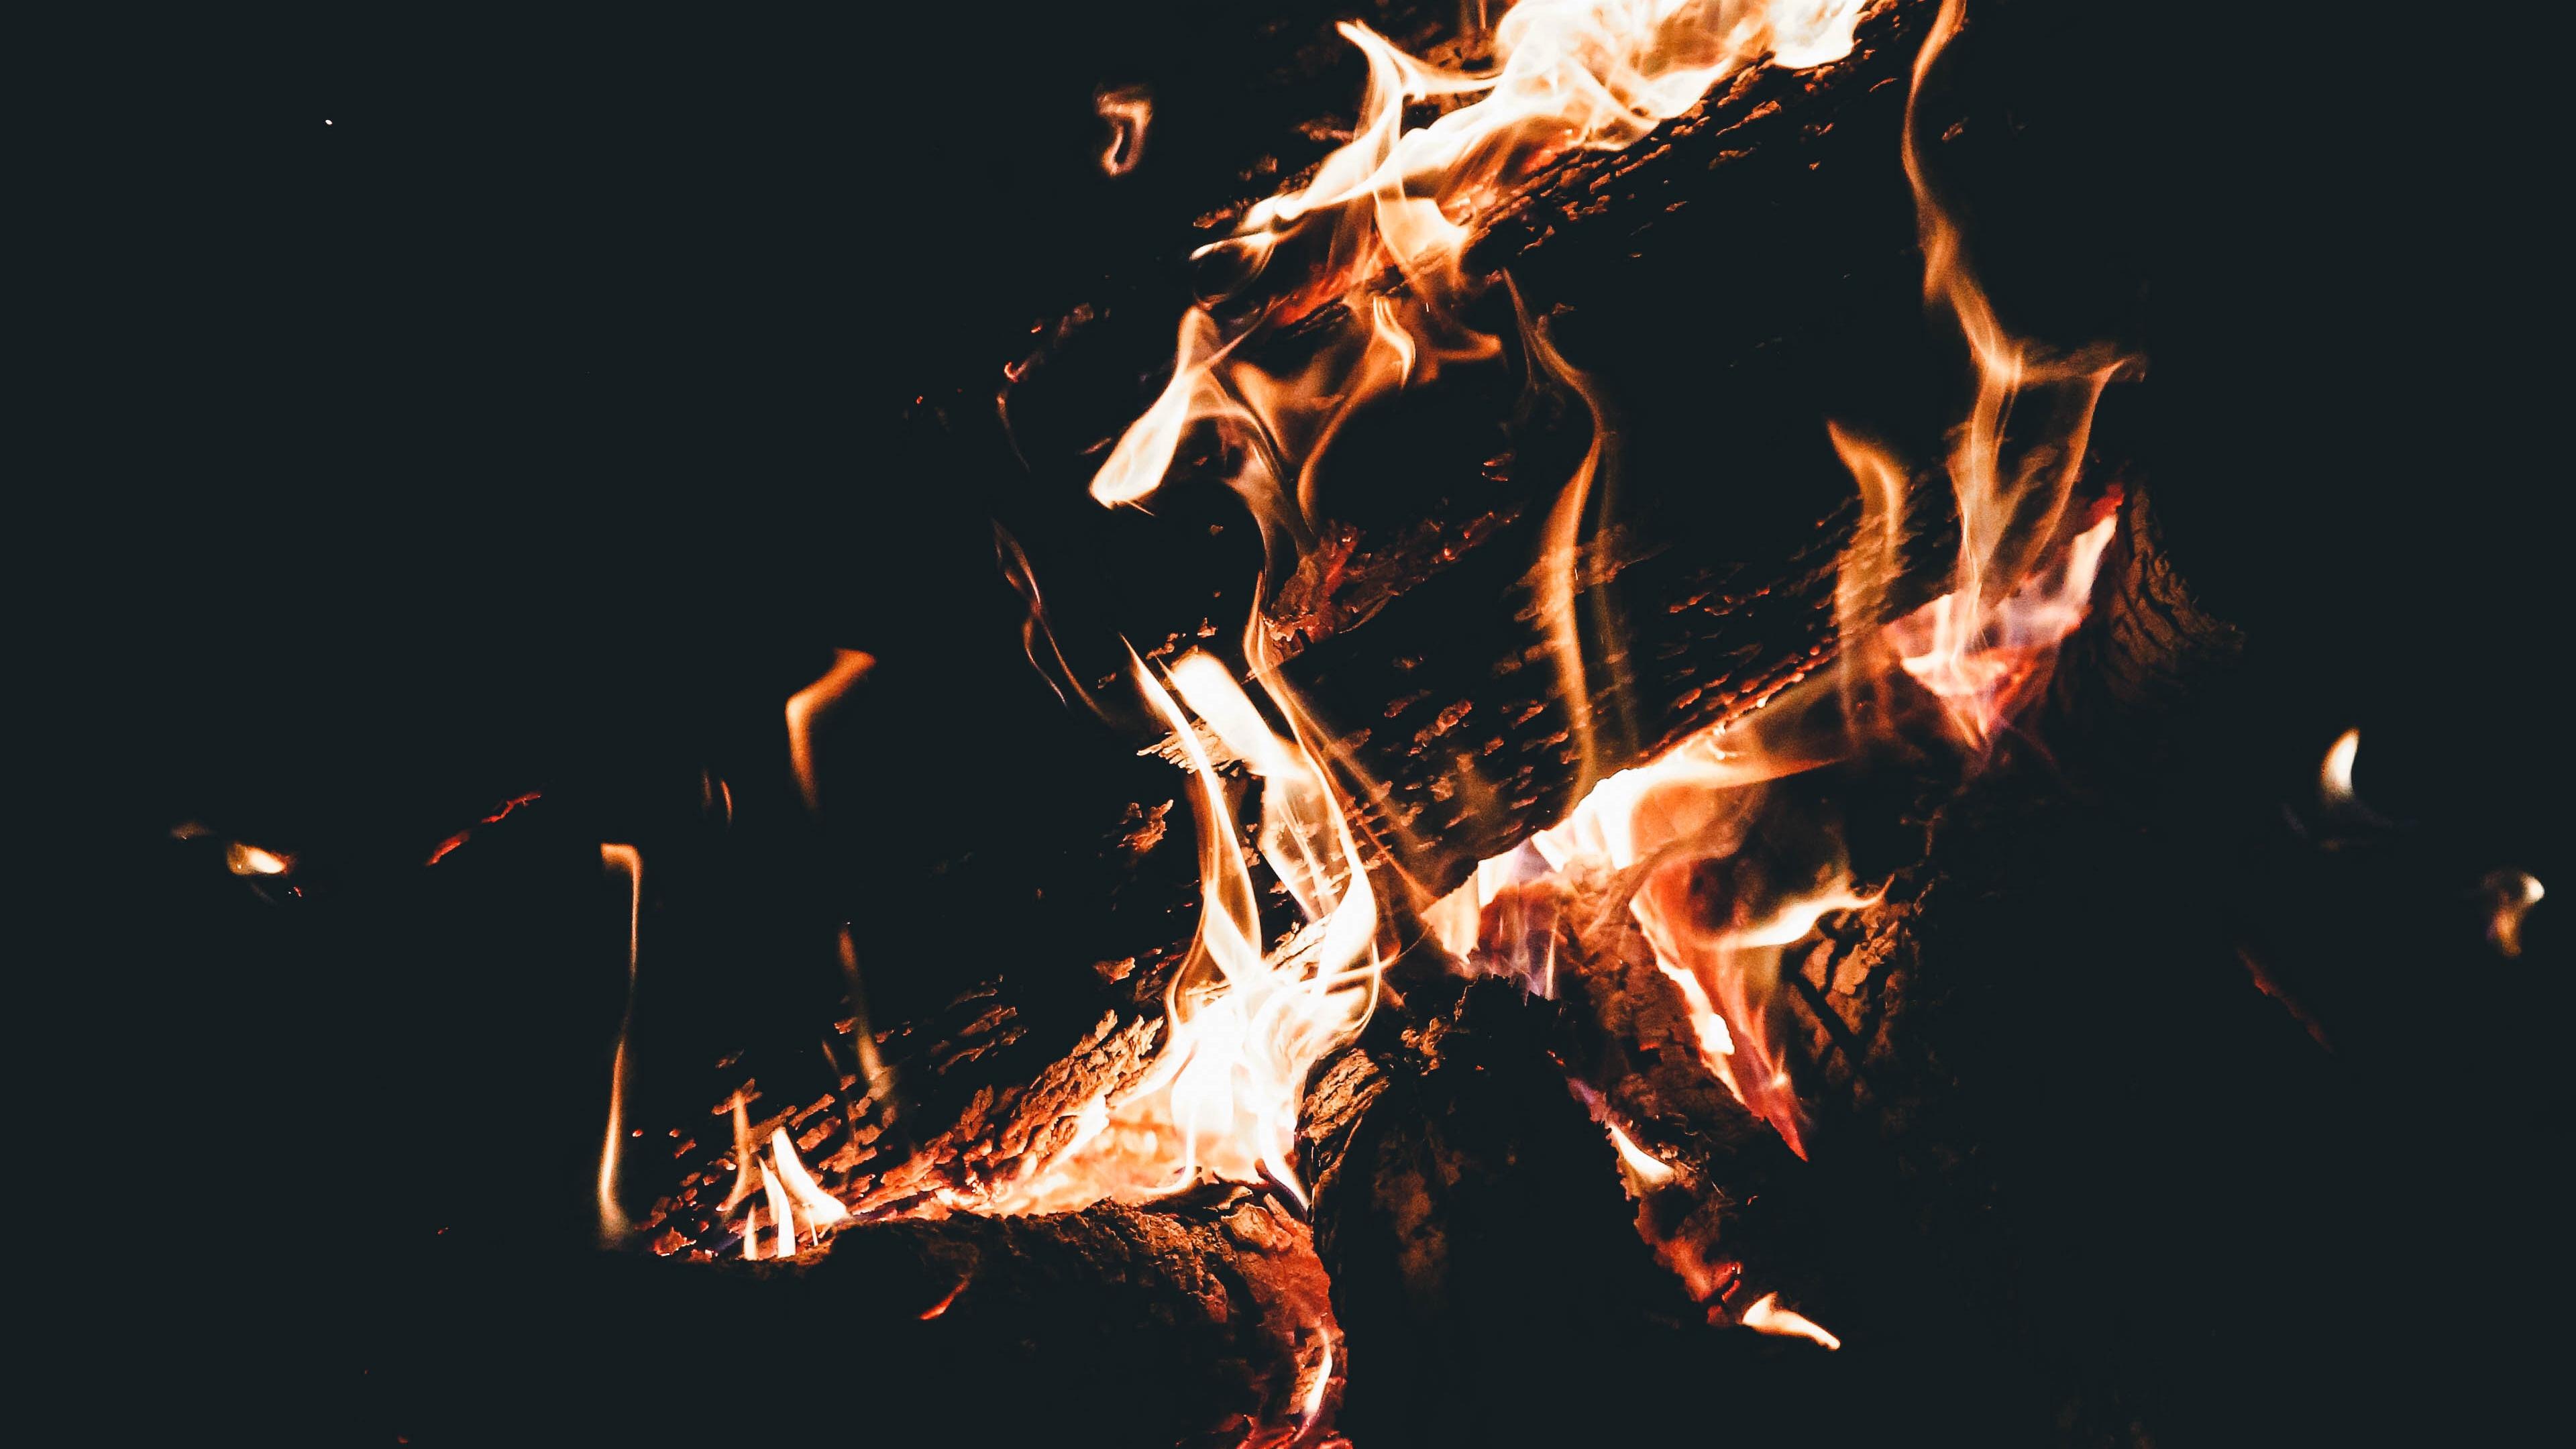 bonfire fire flame firewood dark camping burning 4k 1540575138 - bonfire, fire, flame, firewood, dark, camping, burning 4k - flame, Fire, bonfire